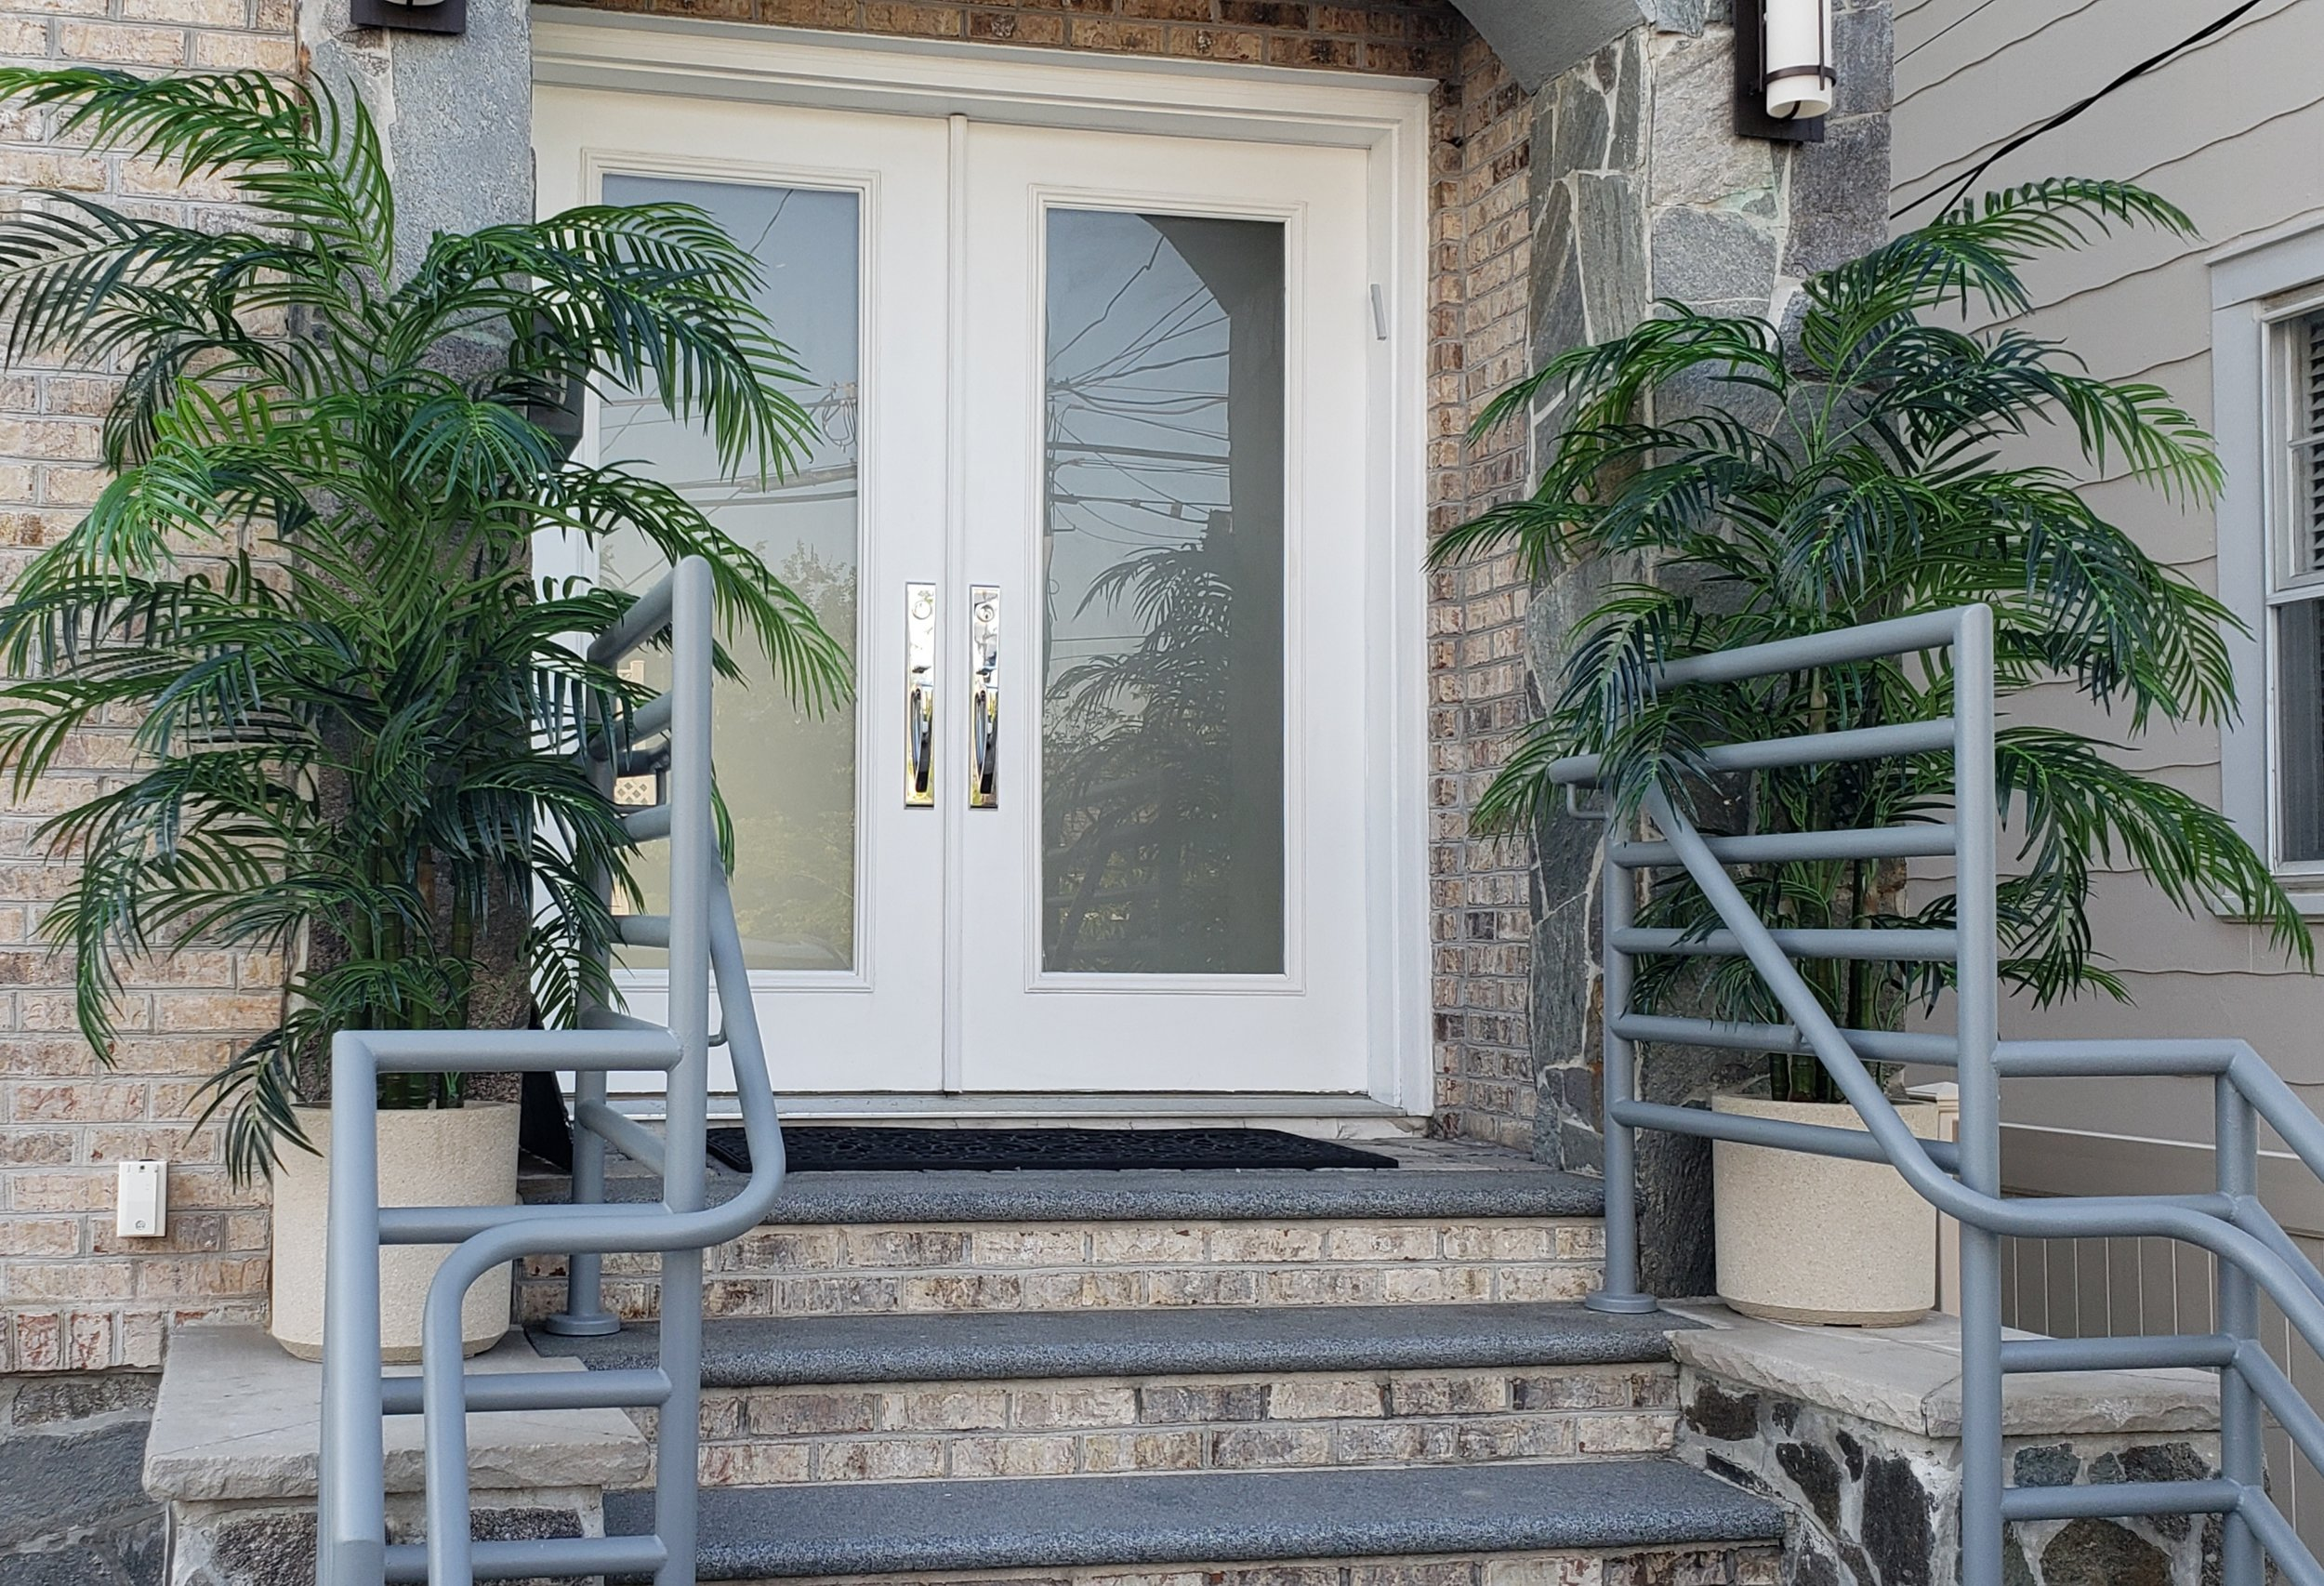 UV Outdoor Areca Palms